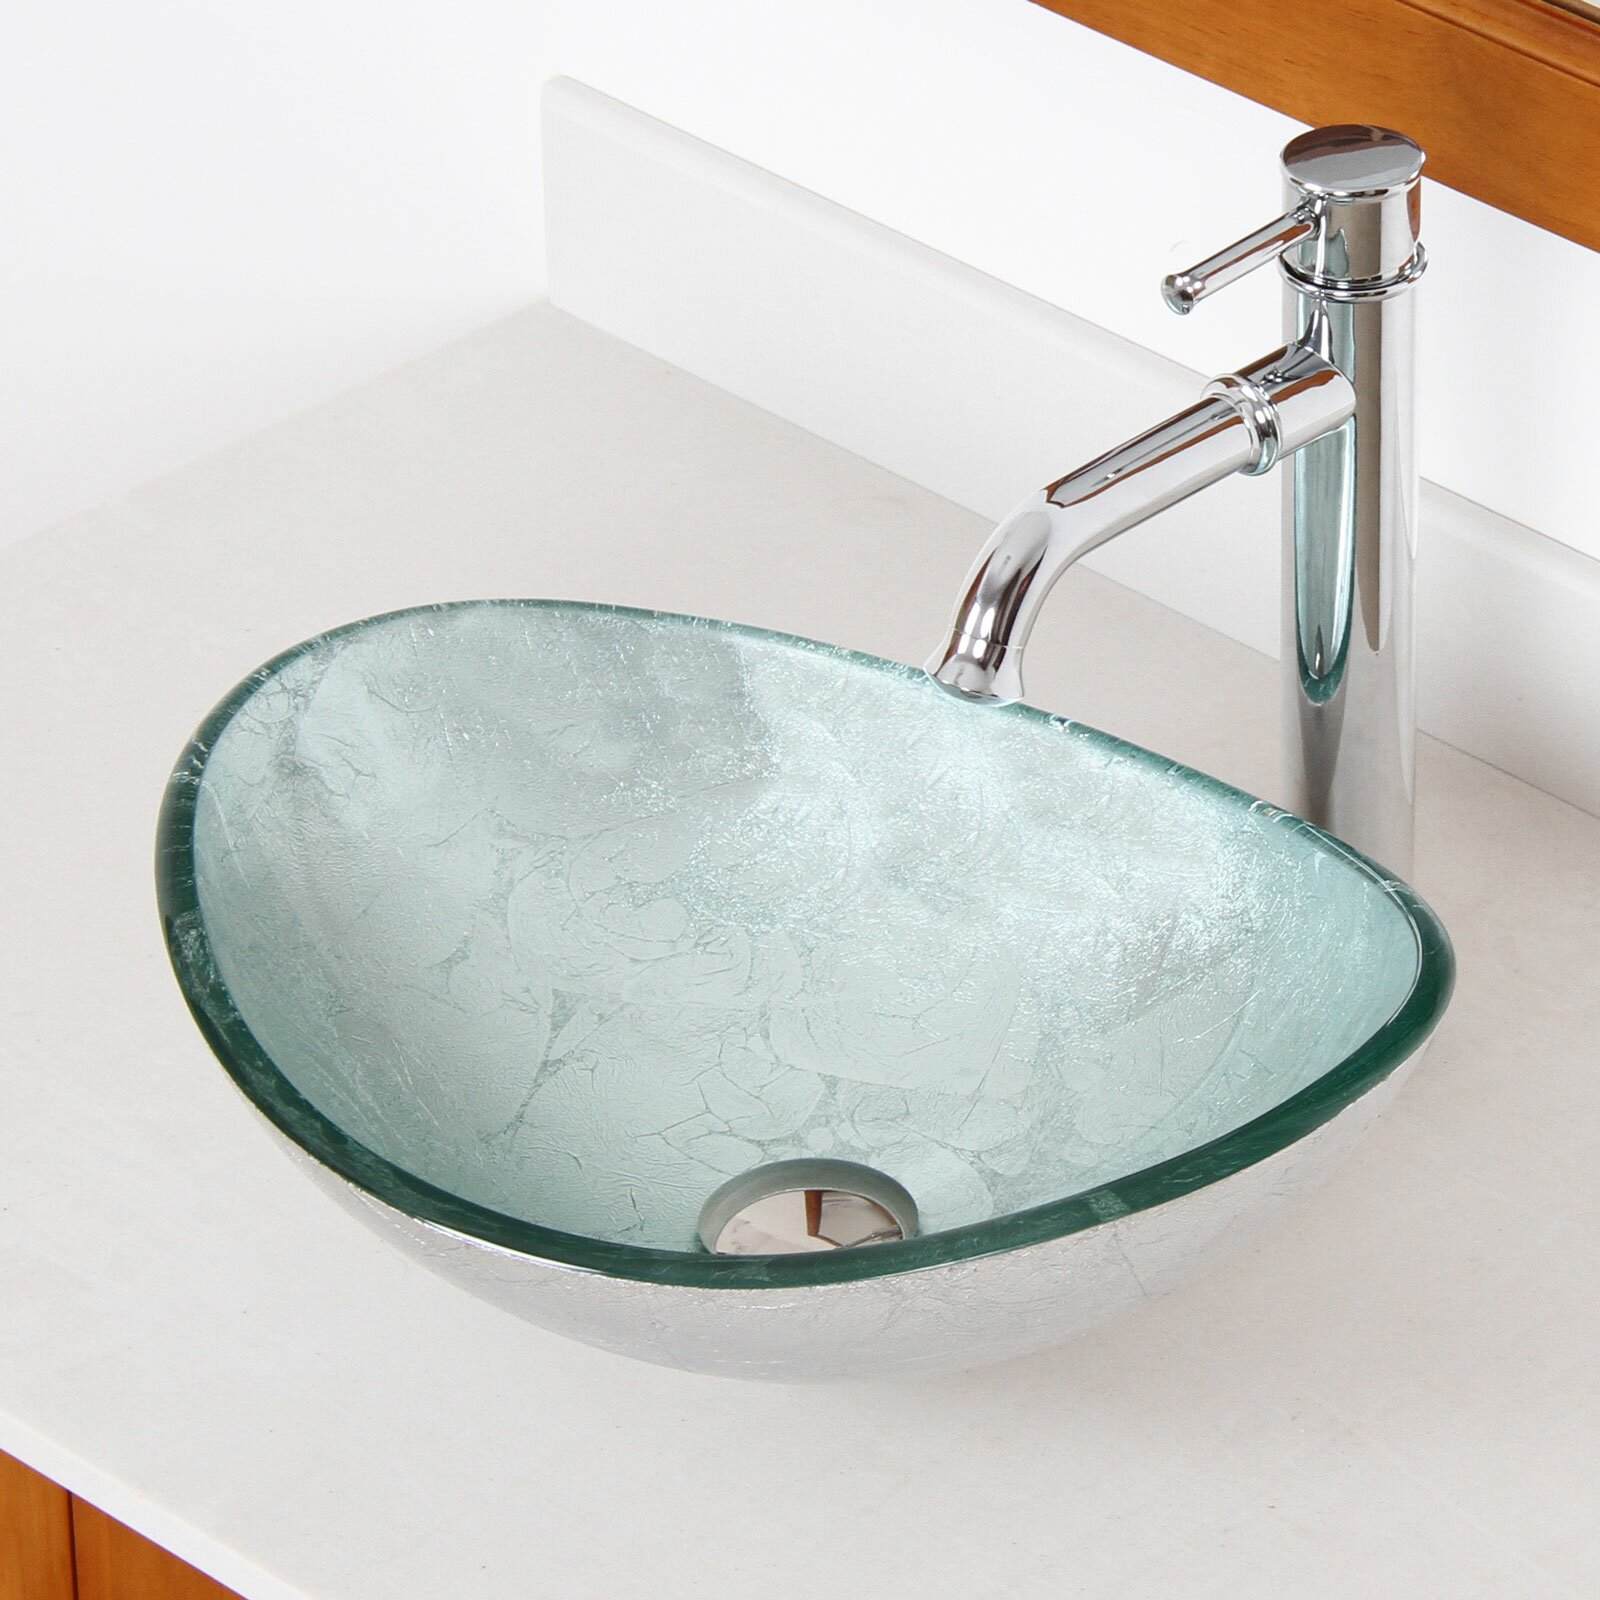 Hand Painted Foil Boat Shaped Oval Bowl Bottom Vessel Bathroom Sink Wayfair